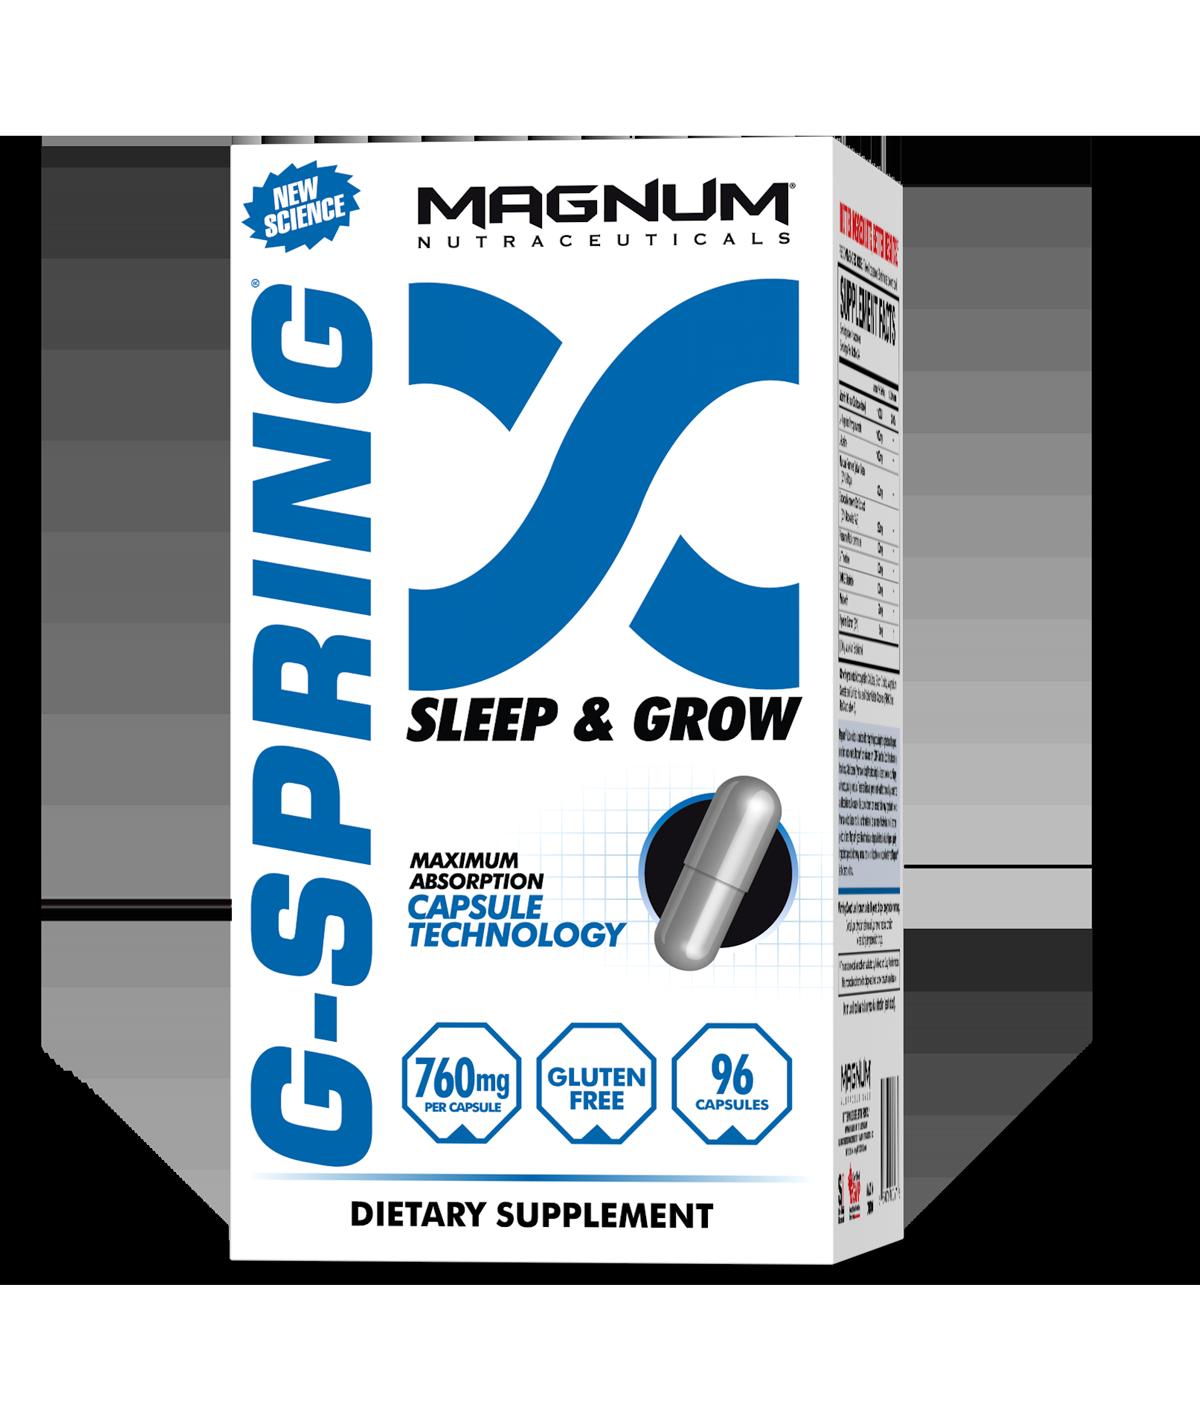 Magnum G-Spring